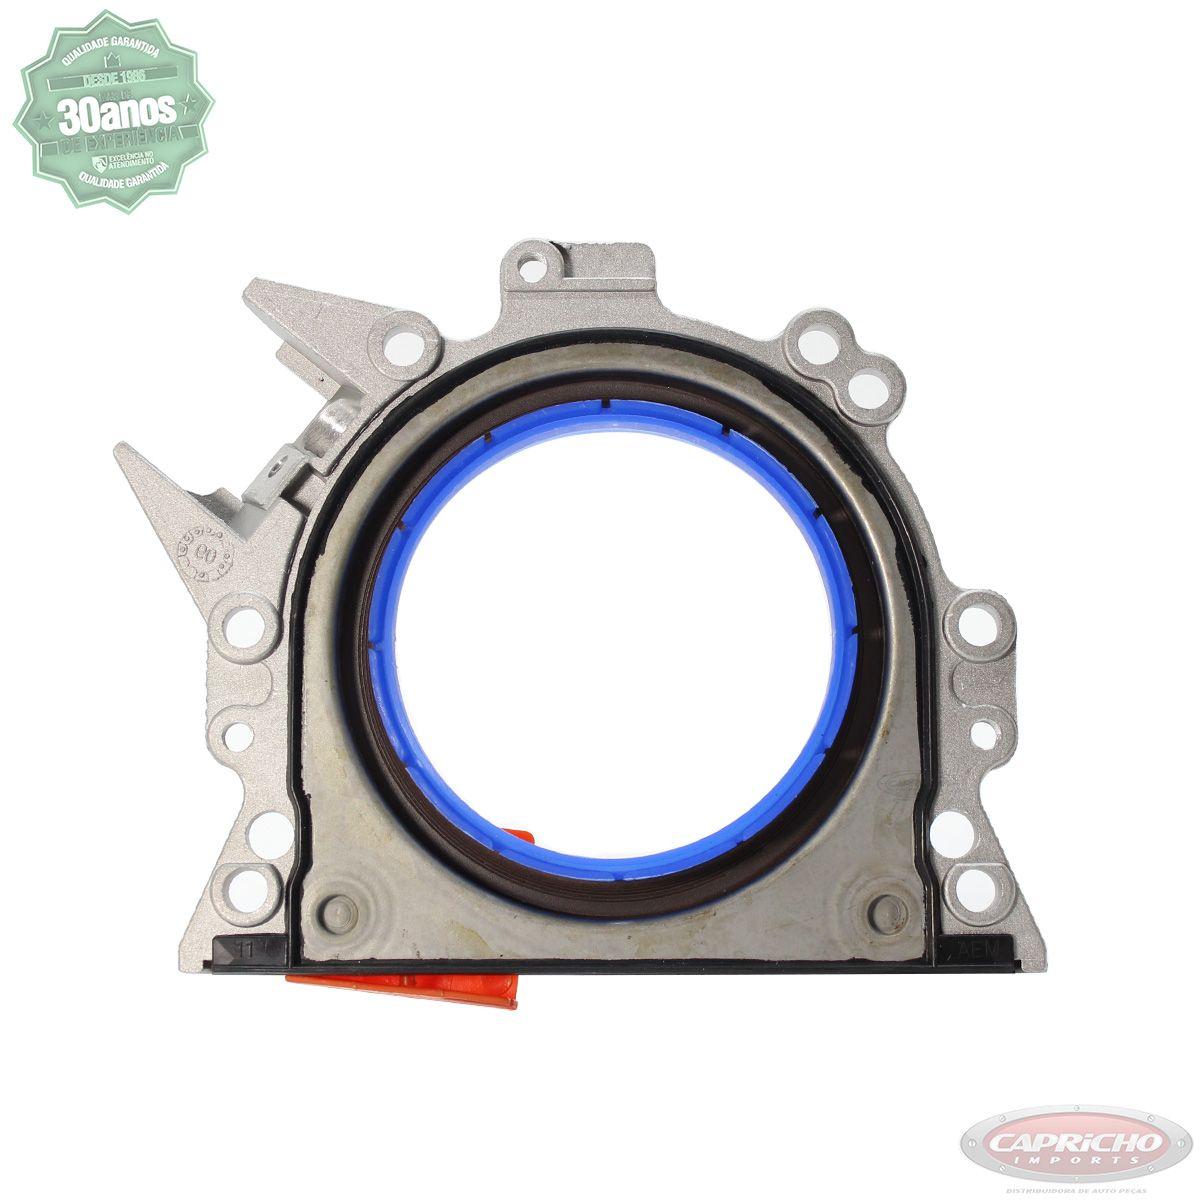 Retentor Volante - Volkswagen Kombi / Polo / Gol / Parati / Saveiro / Parati